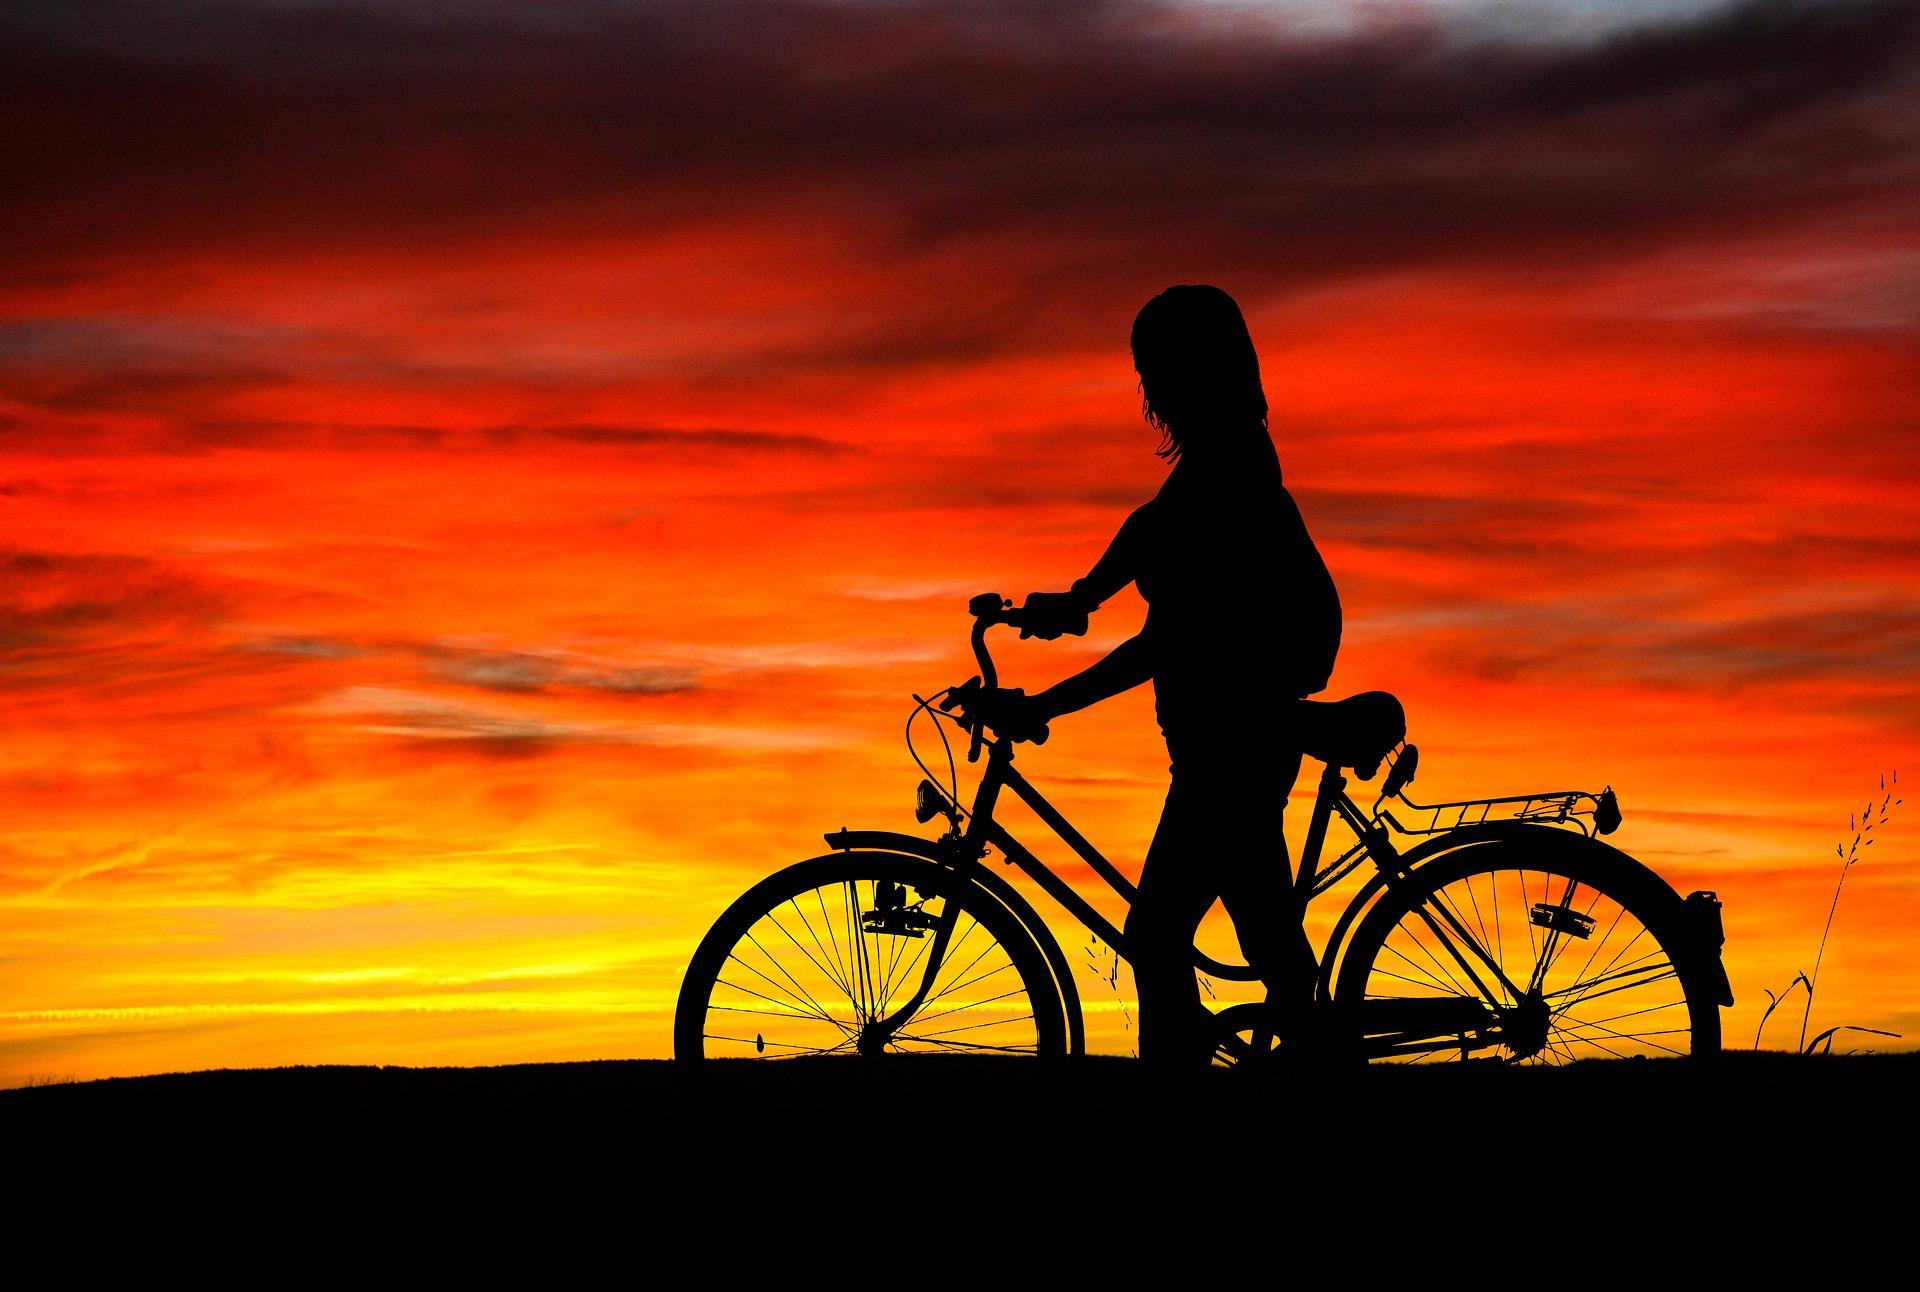 sunset-2374412_1920.jpg